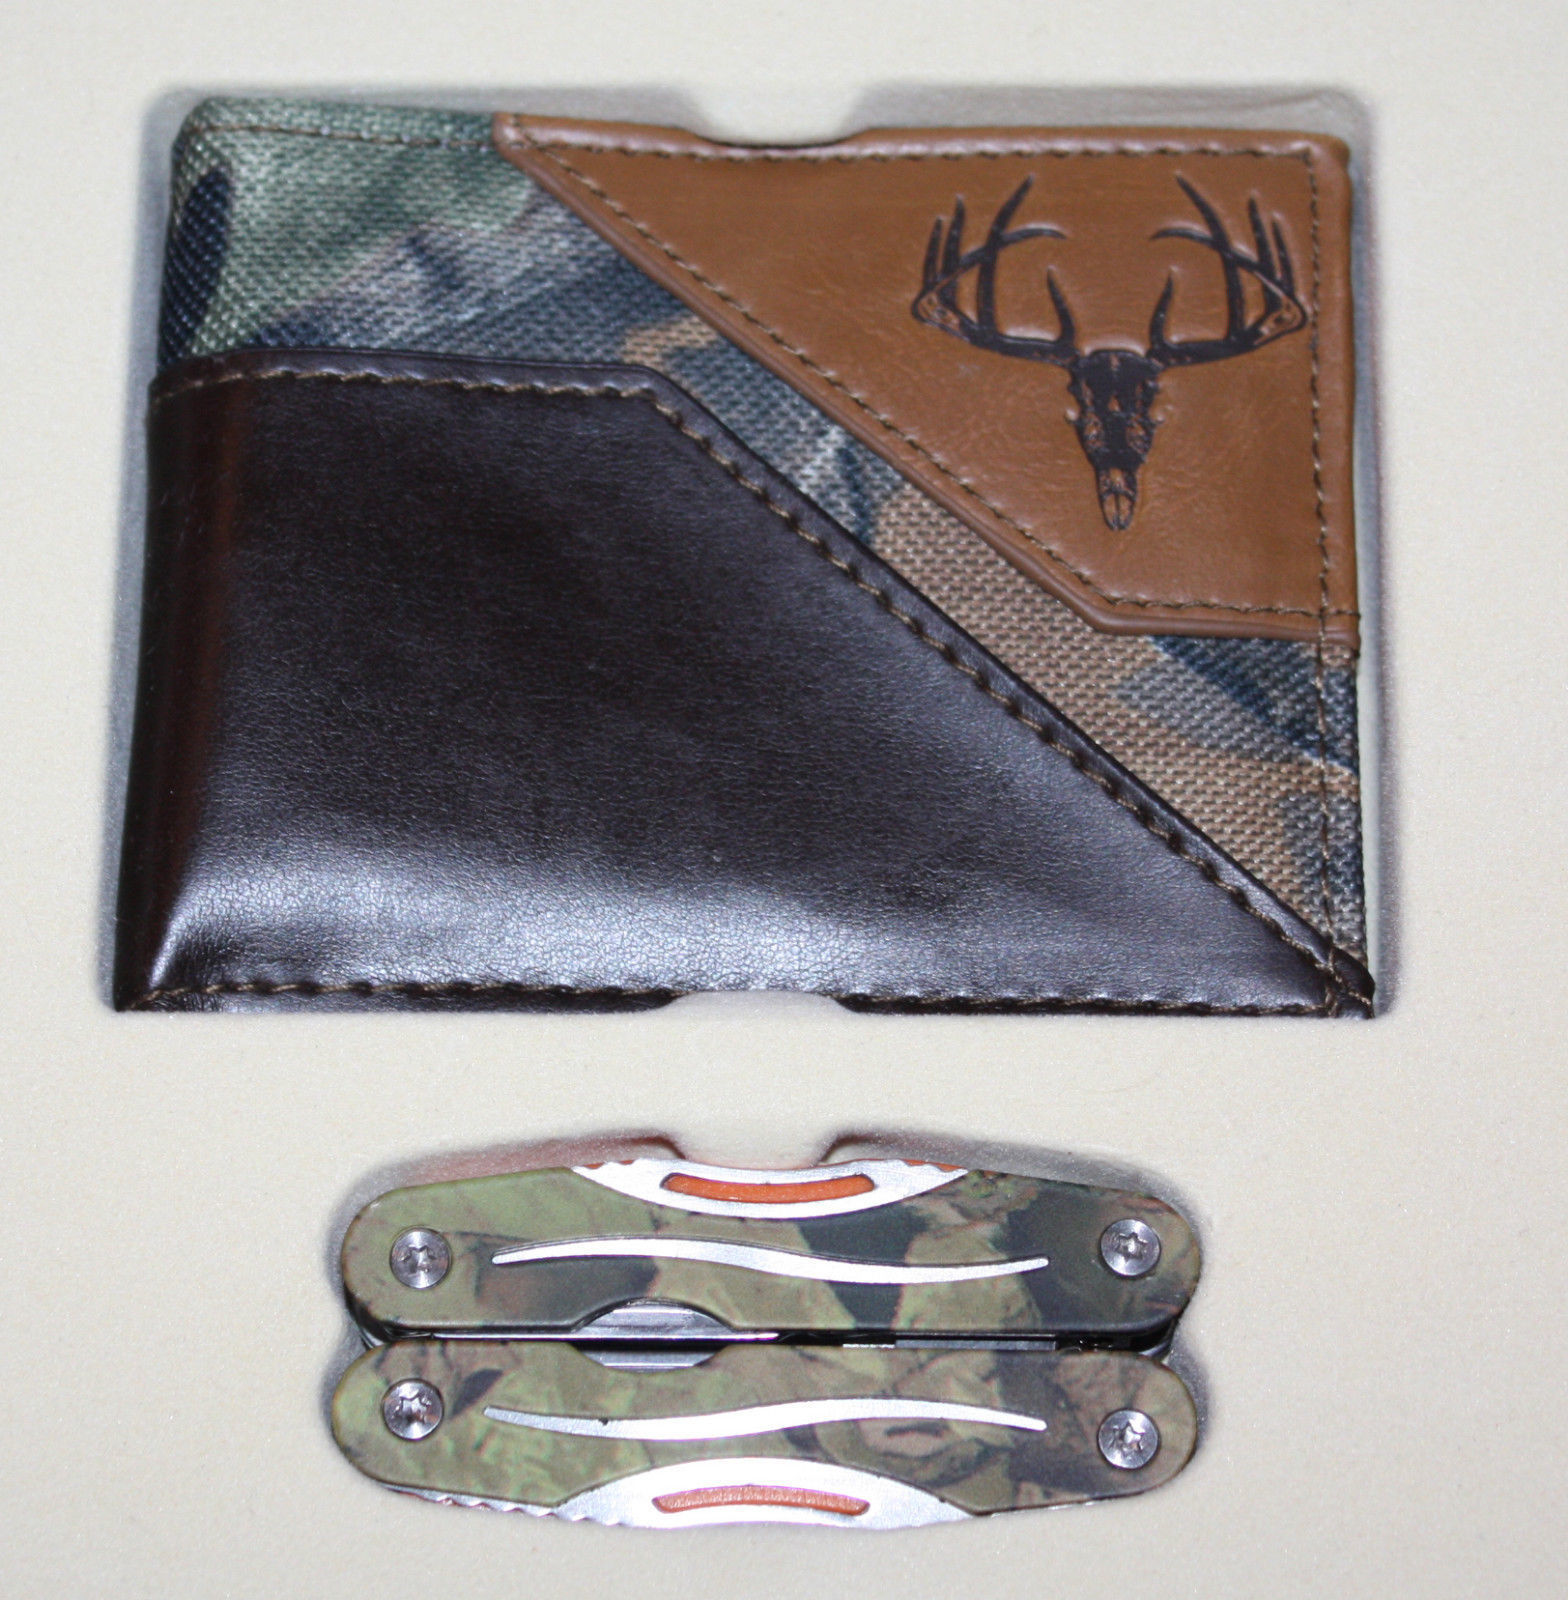 Wallet & Multi-Tool